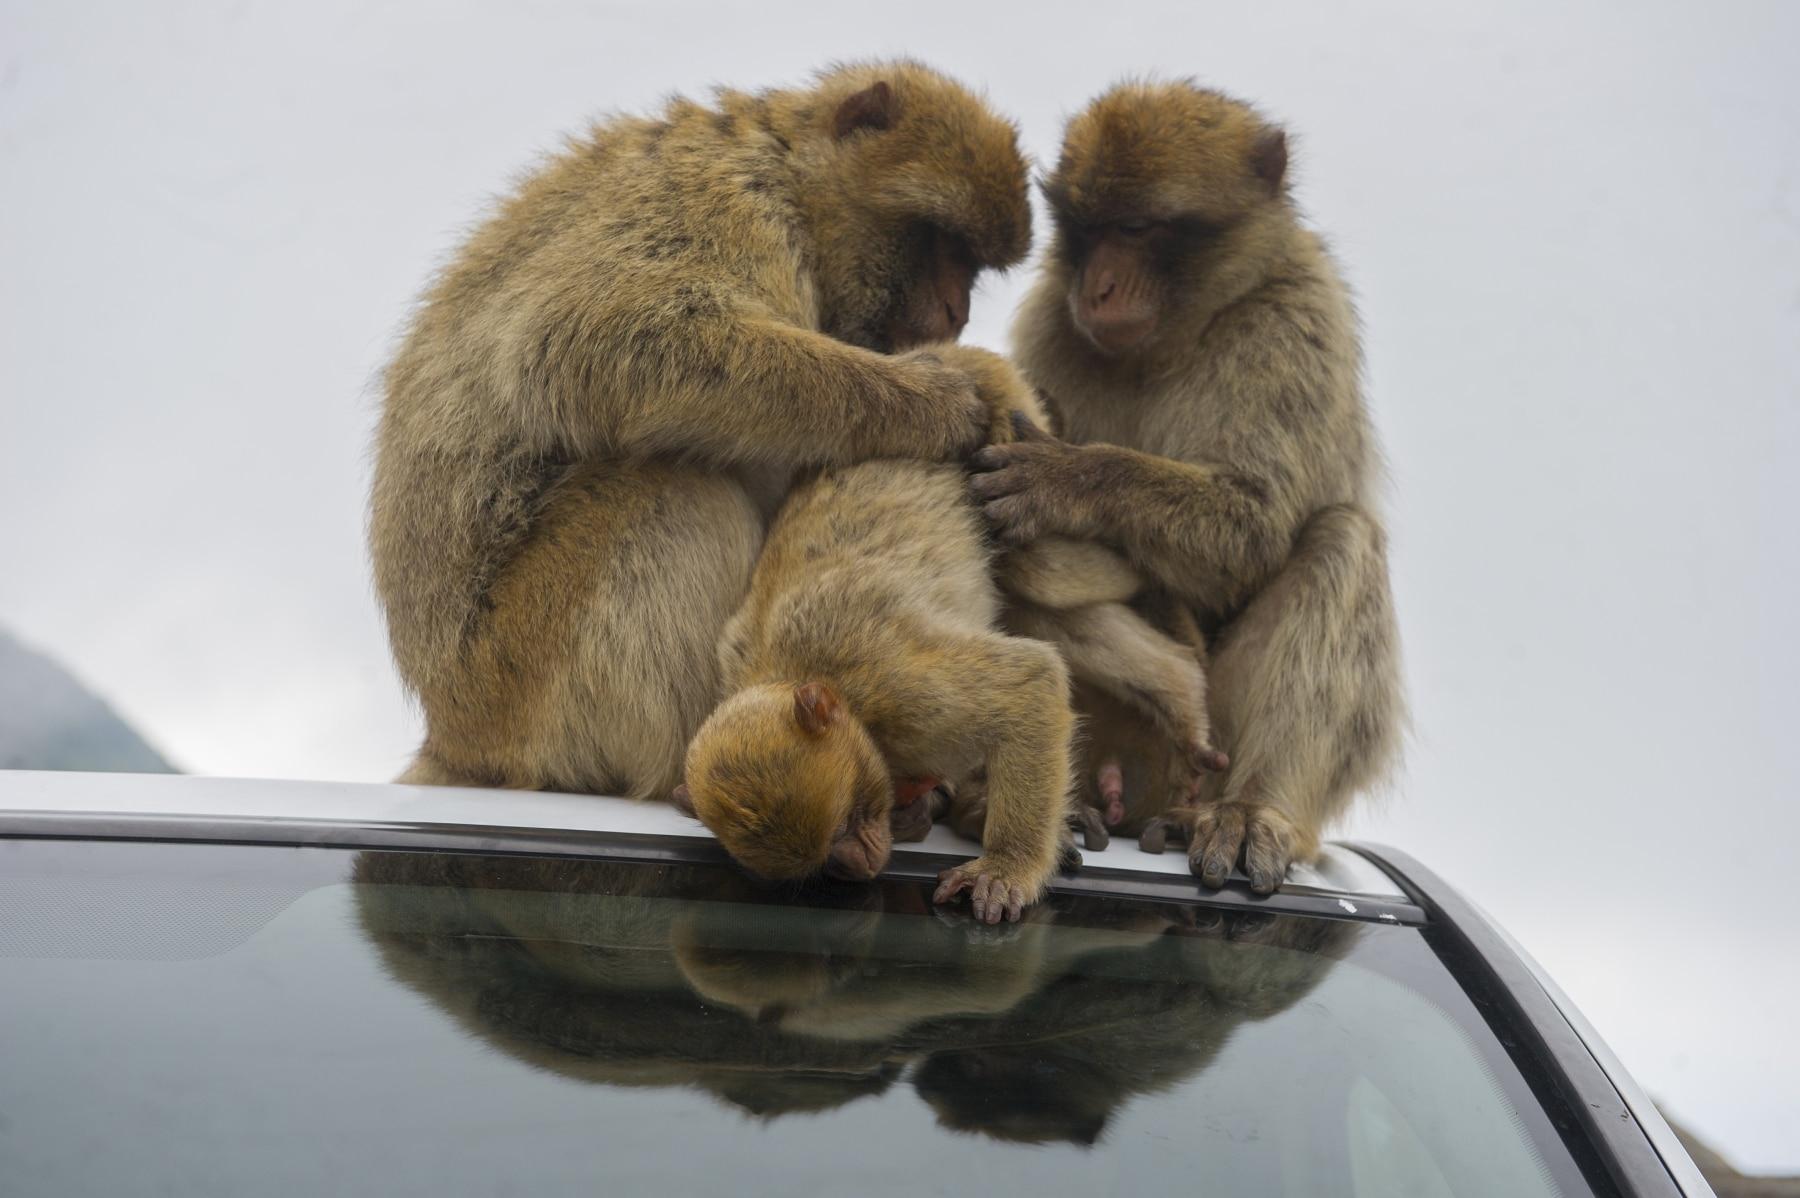 monos-zona-alta-del-pen-con-turistas-13_9222296481_o